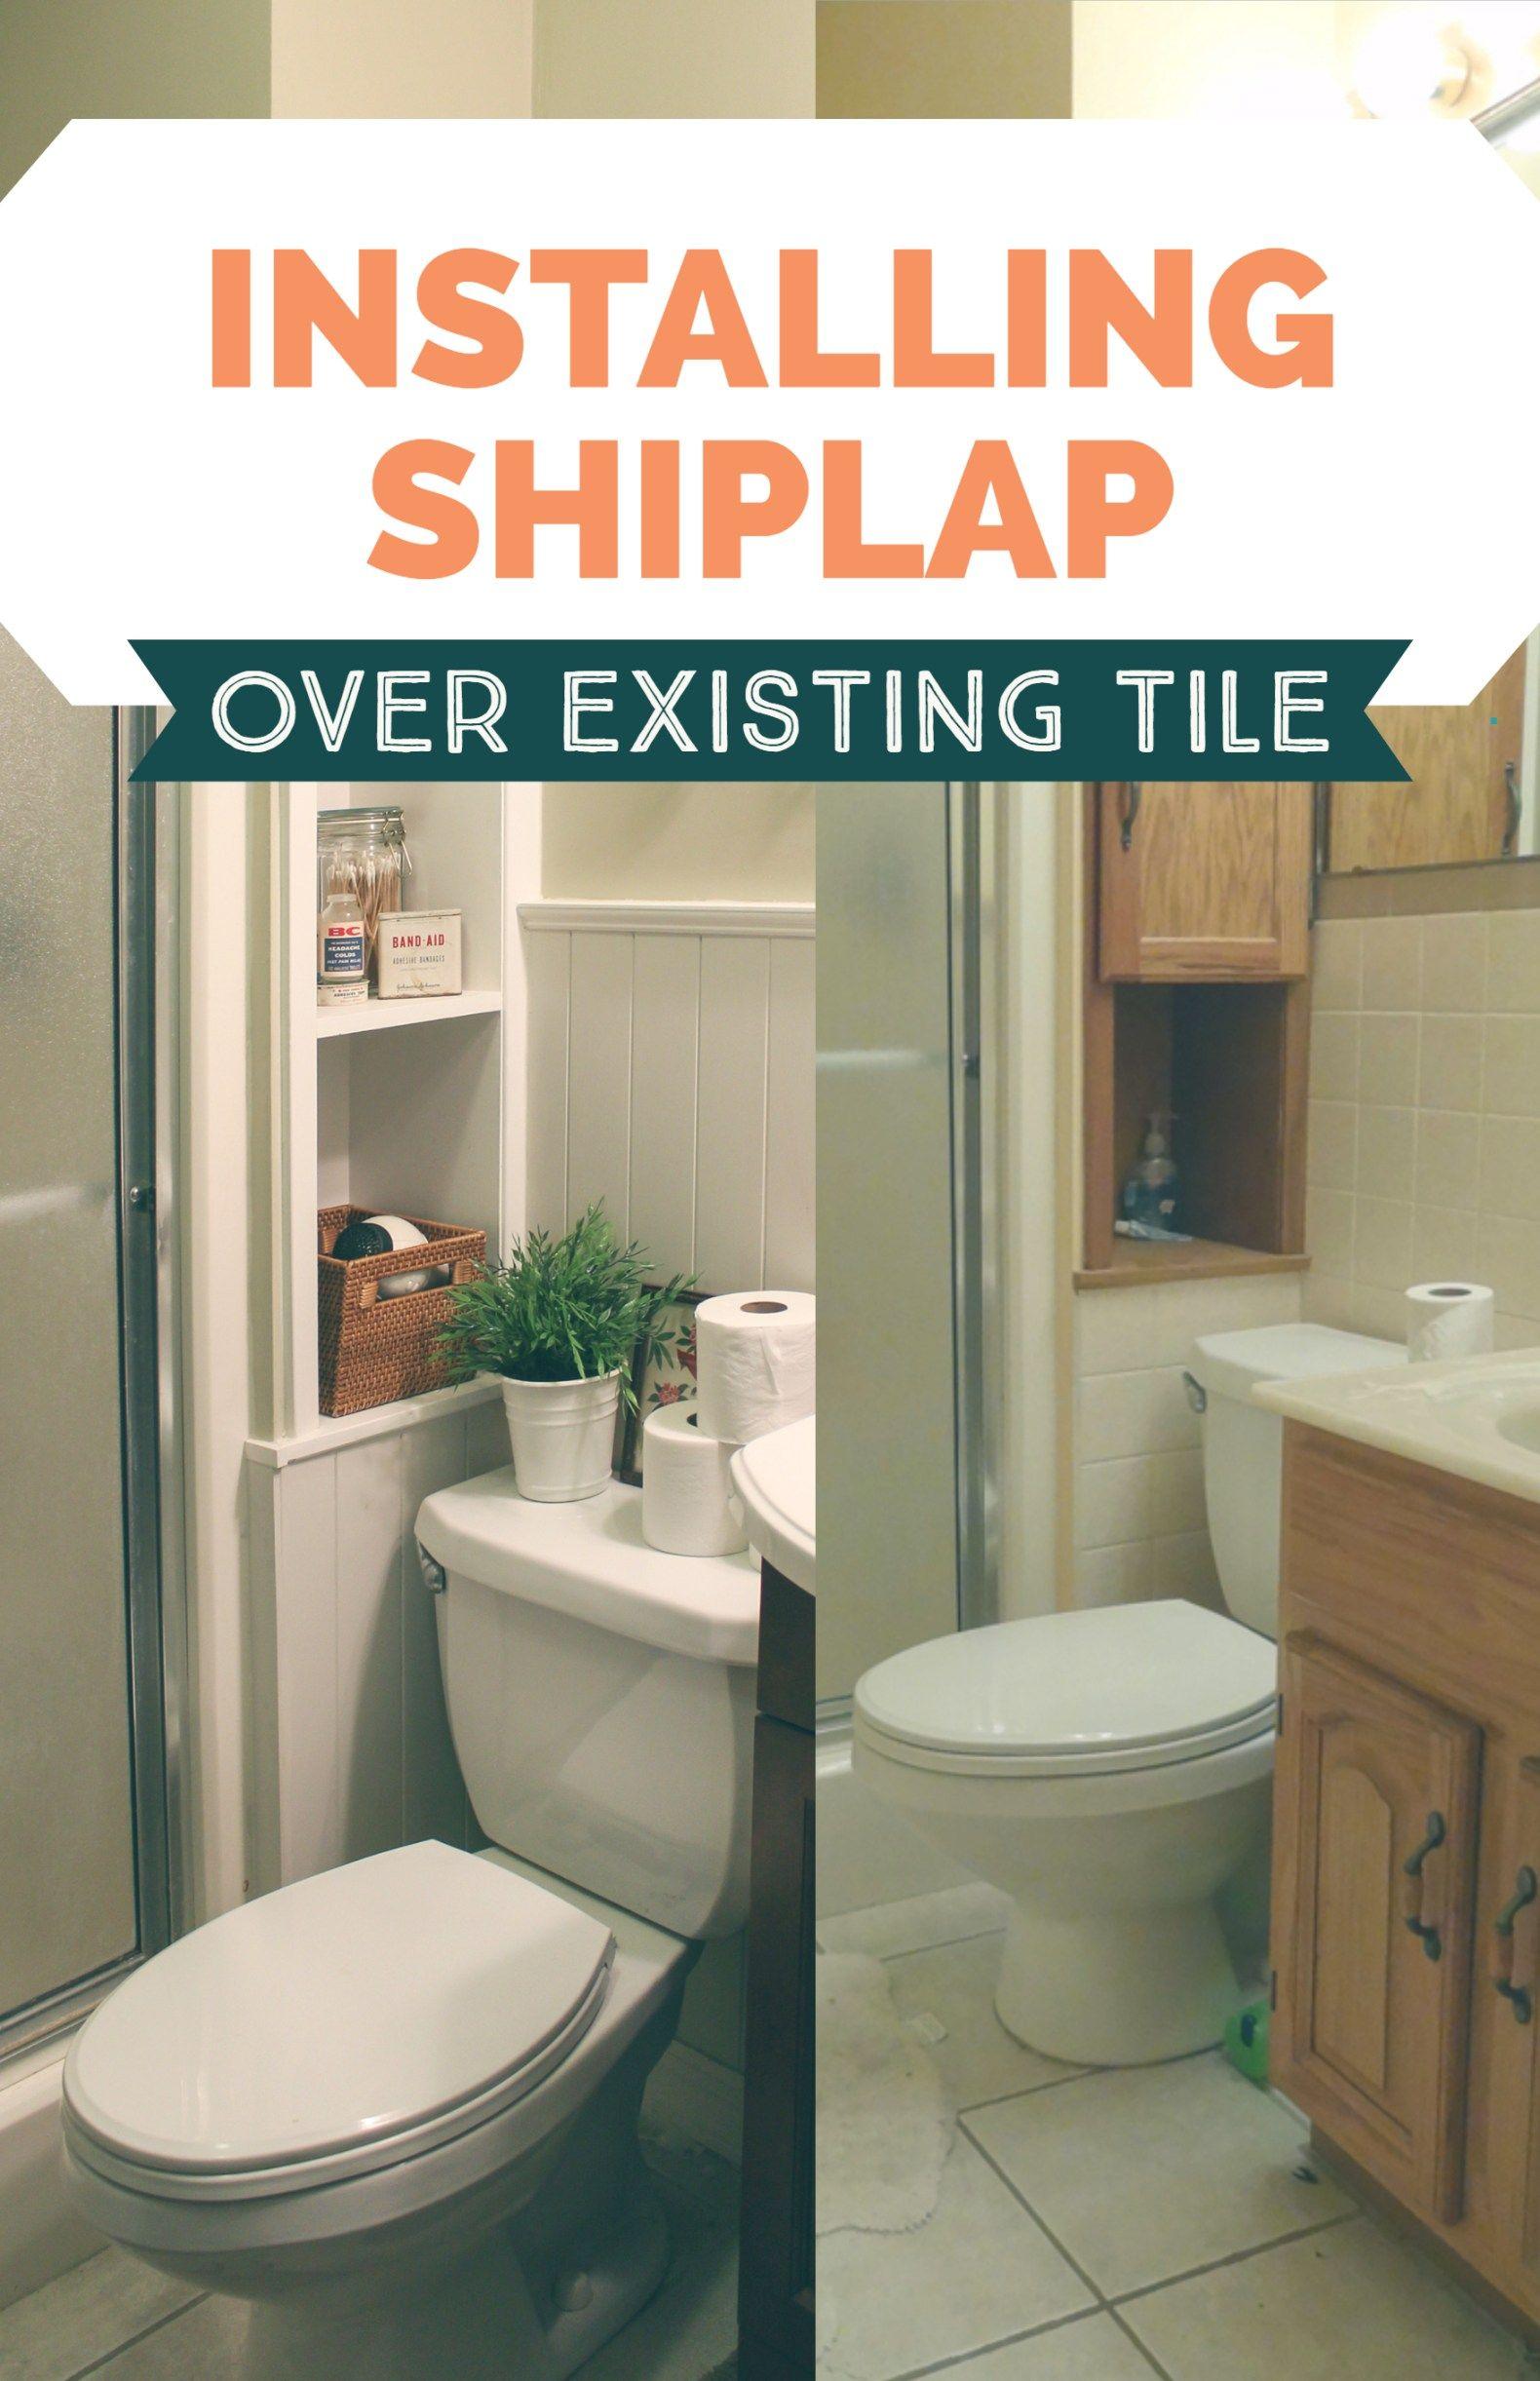 300 Bathroom Remodel Installing Shiplap Or Paneling Over Tile Installing Shiplap Shiplap Bathroom Shiplap